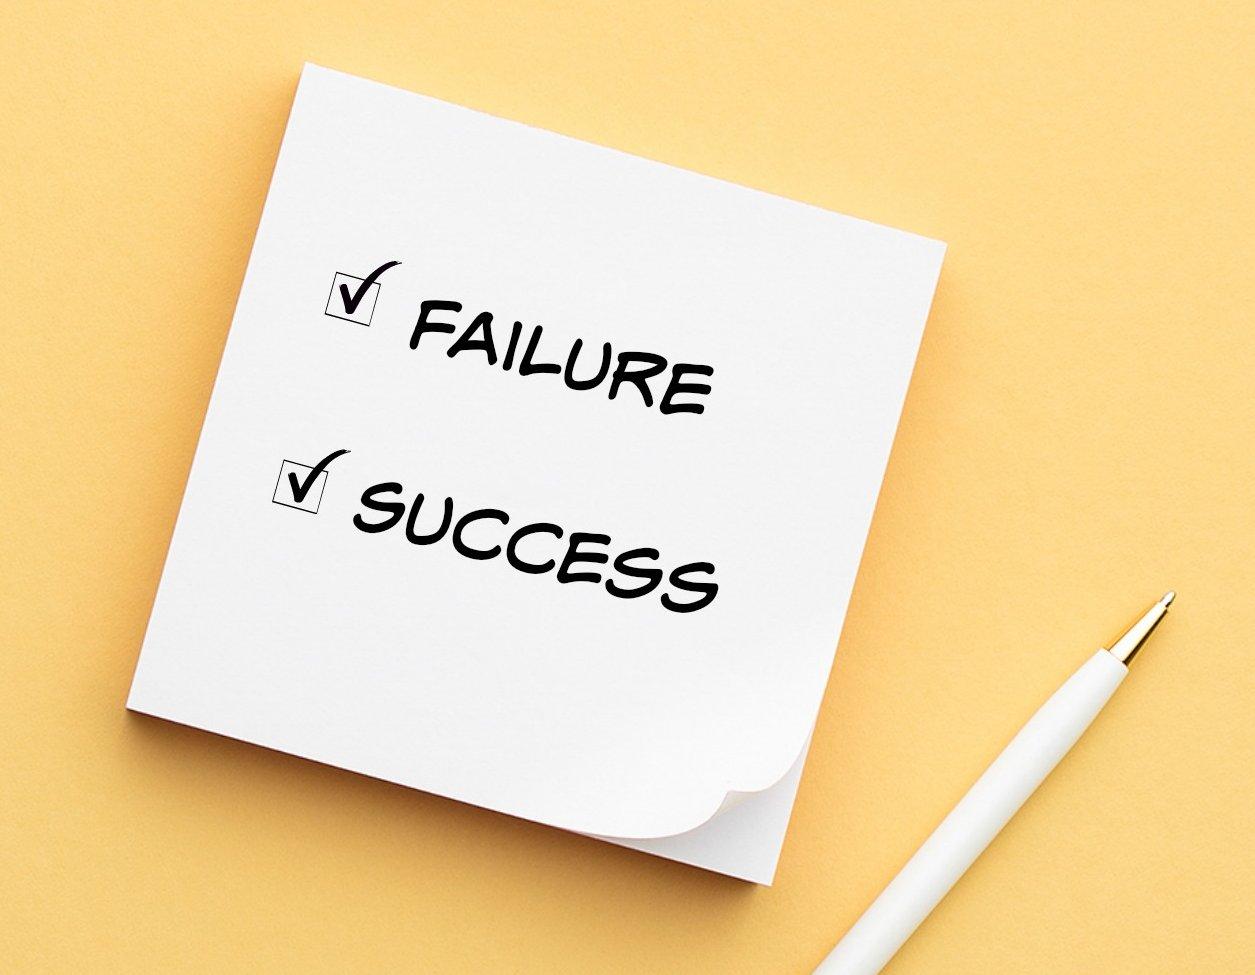 Creative Small Business Success: 5 Ways Failure Made Me Succeed